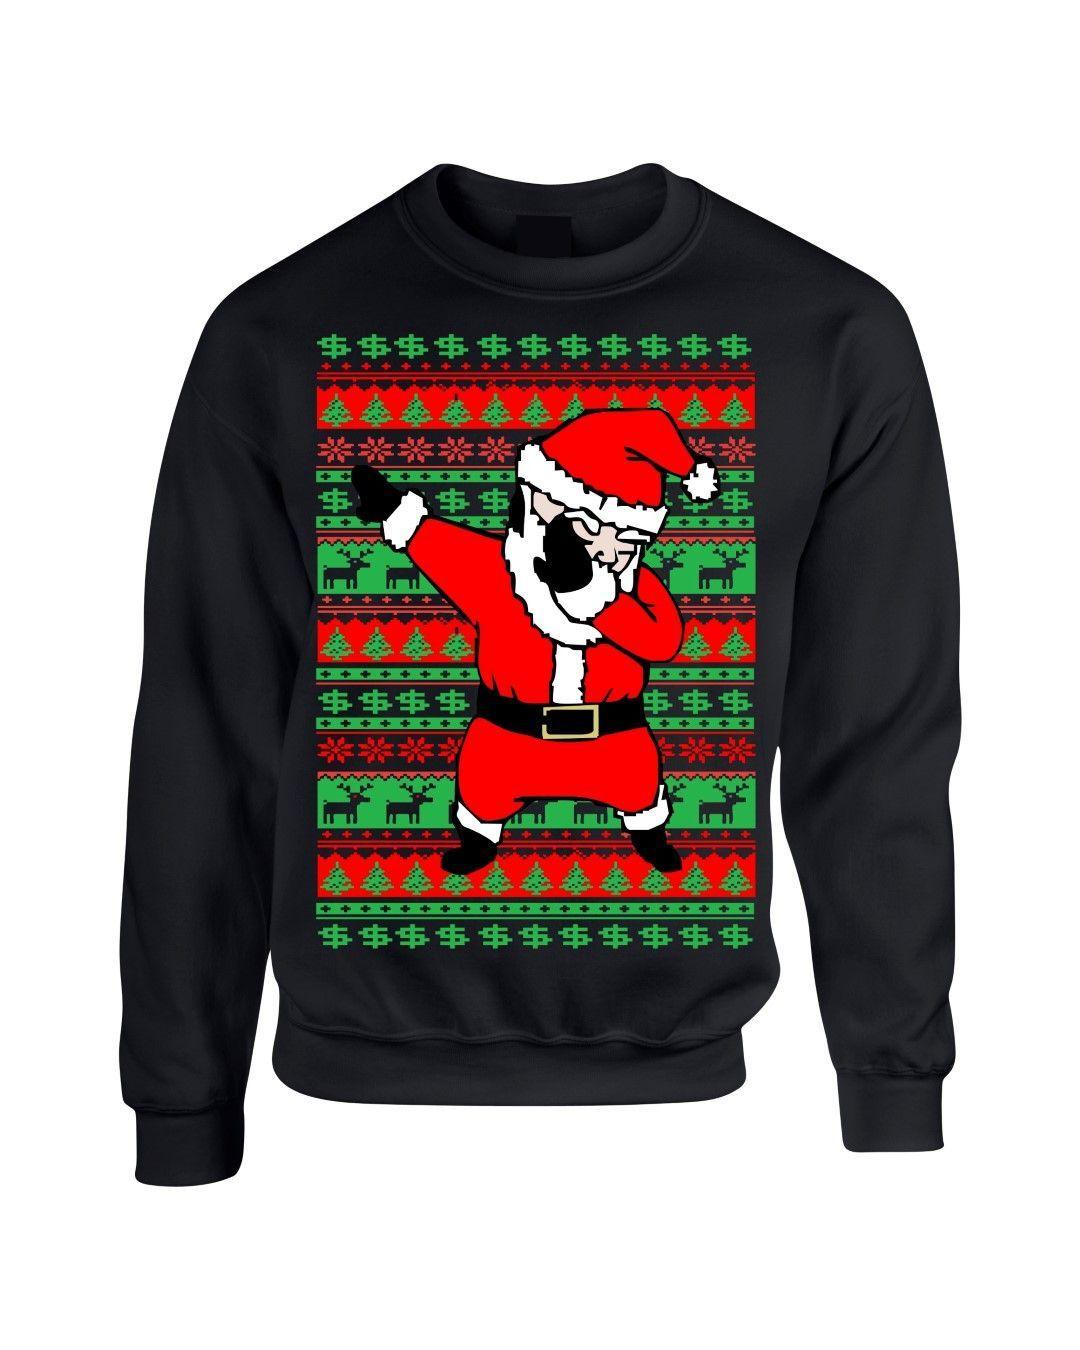 caadf462 Dabbing santa ugly christmas sweater women sweatshirt Merry christmas gift Santa  Claus doing the dab dance